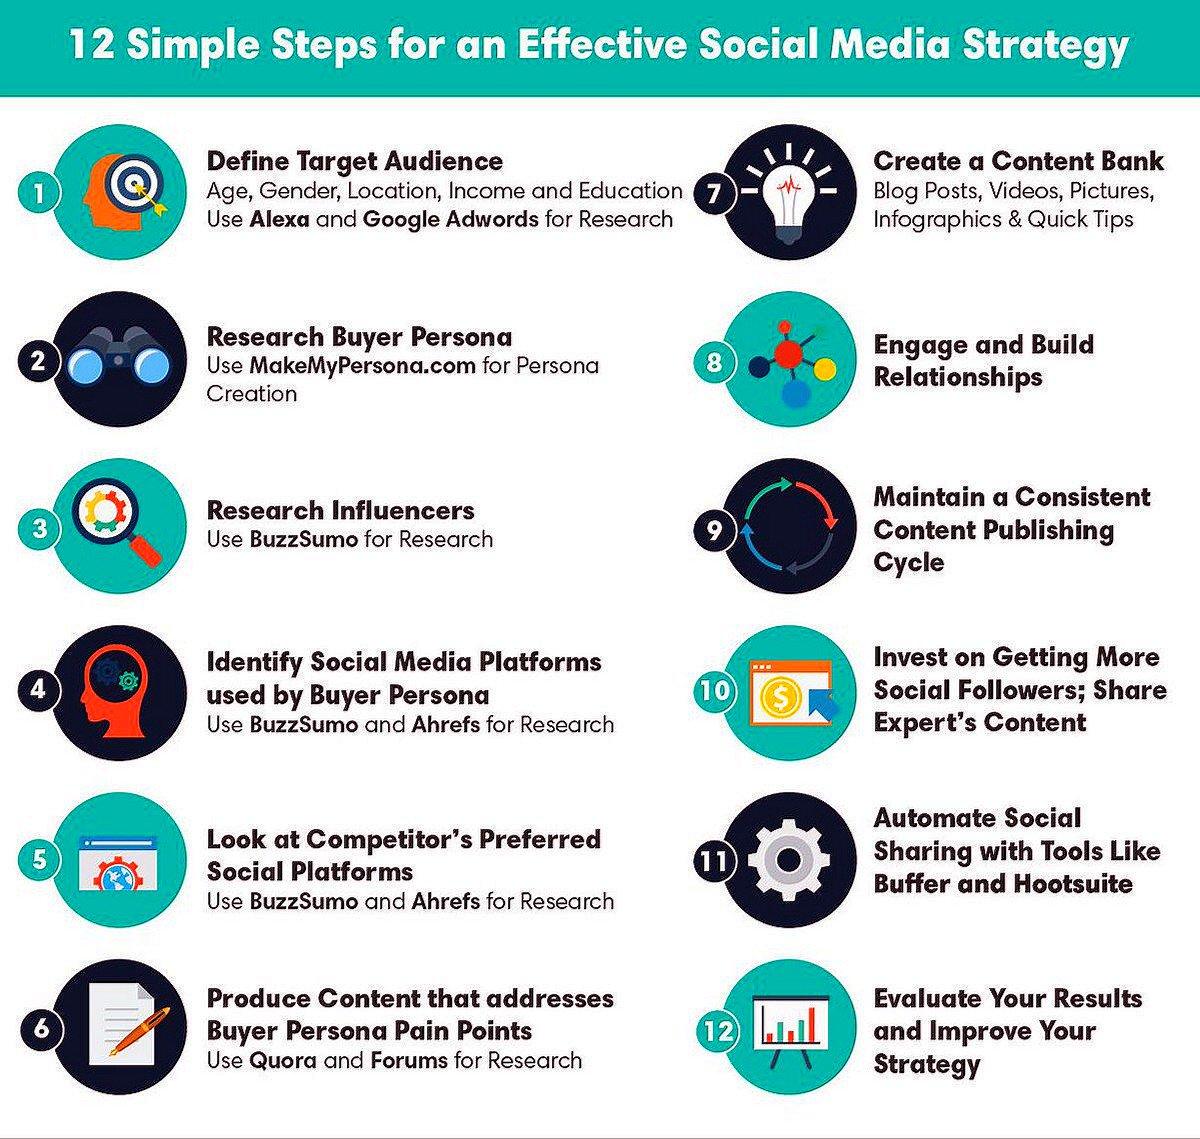 RT @ipfconline1 12 Steps 2 Build UR #SocialMediaStrategy #MarketingTips #BusinessTips #Entrepreneur #JDDyolaBks<br>http://pic.twitter.com/BY7ABOW7JB  https:// twitter.com/ipfconline1/st atus/889696806074015749 &nbsp; …